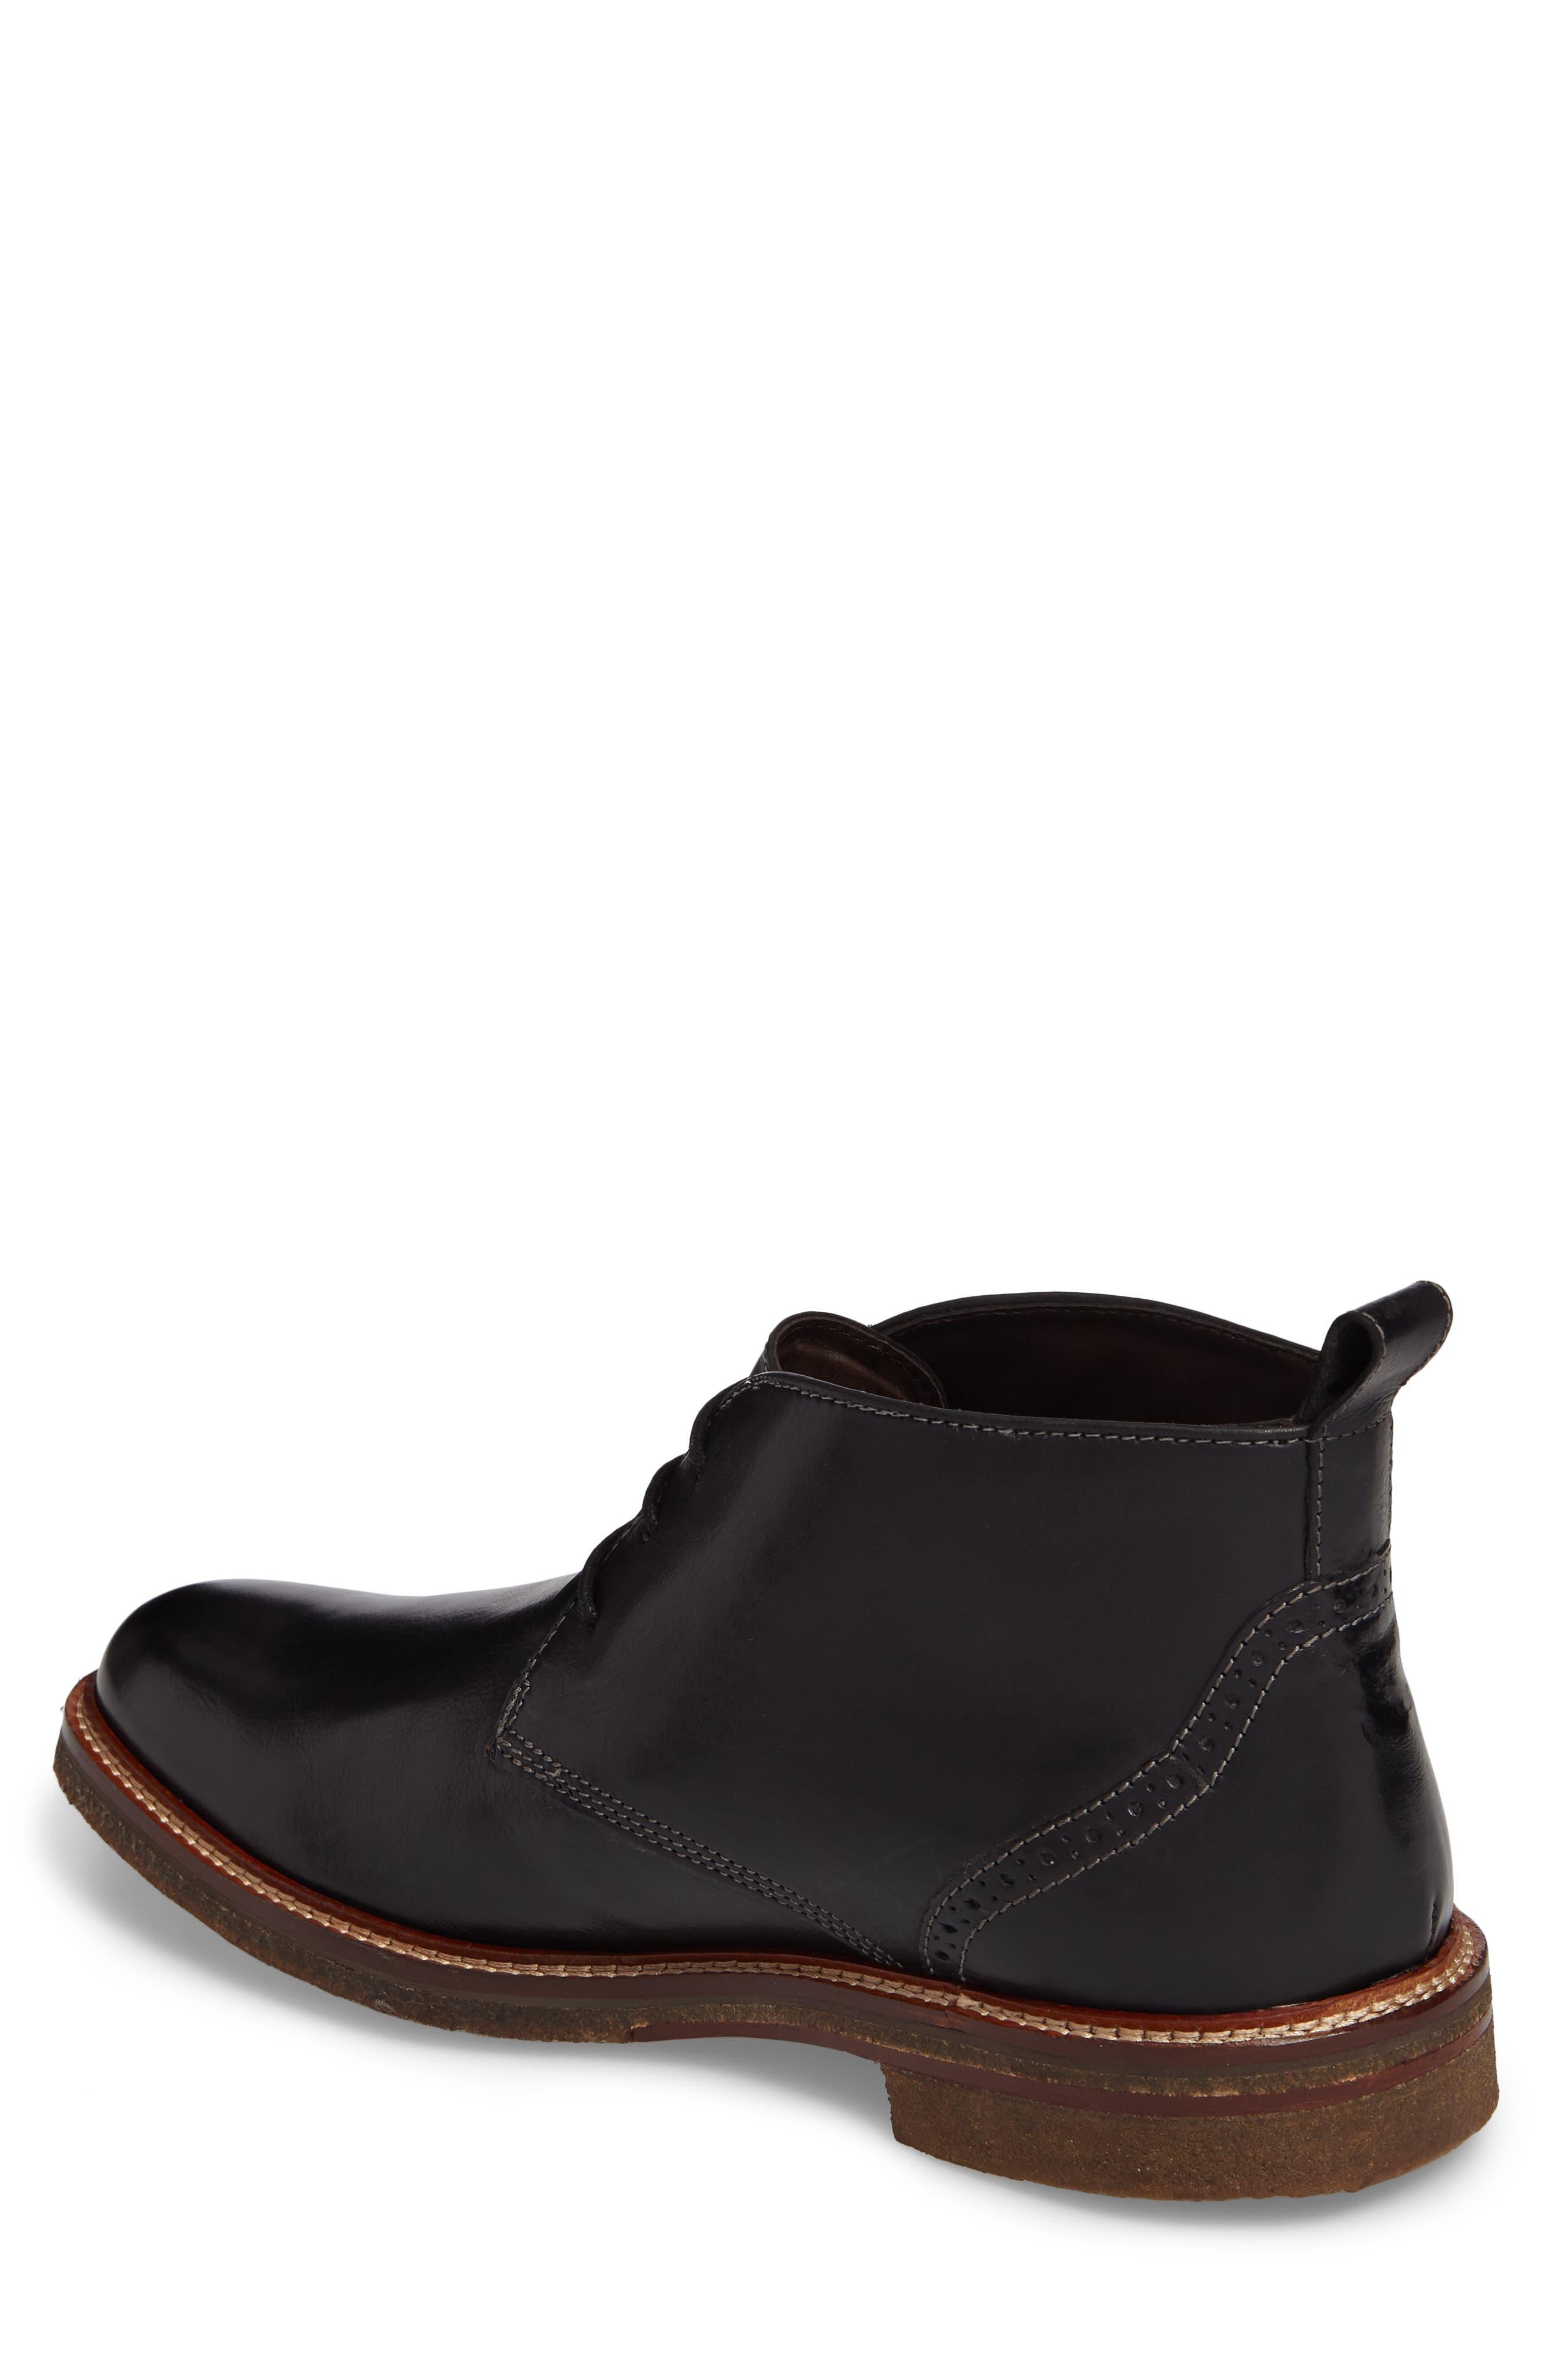 Forrester Chukka Boot,                             Alternate thumbnail 2, color,                             Black Leather